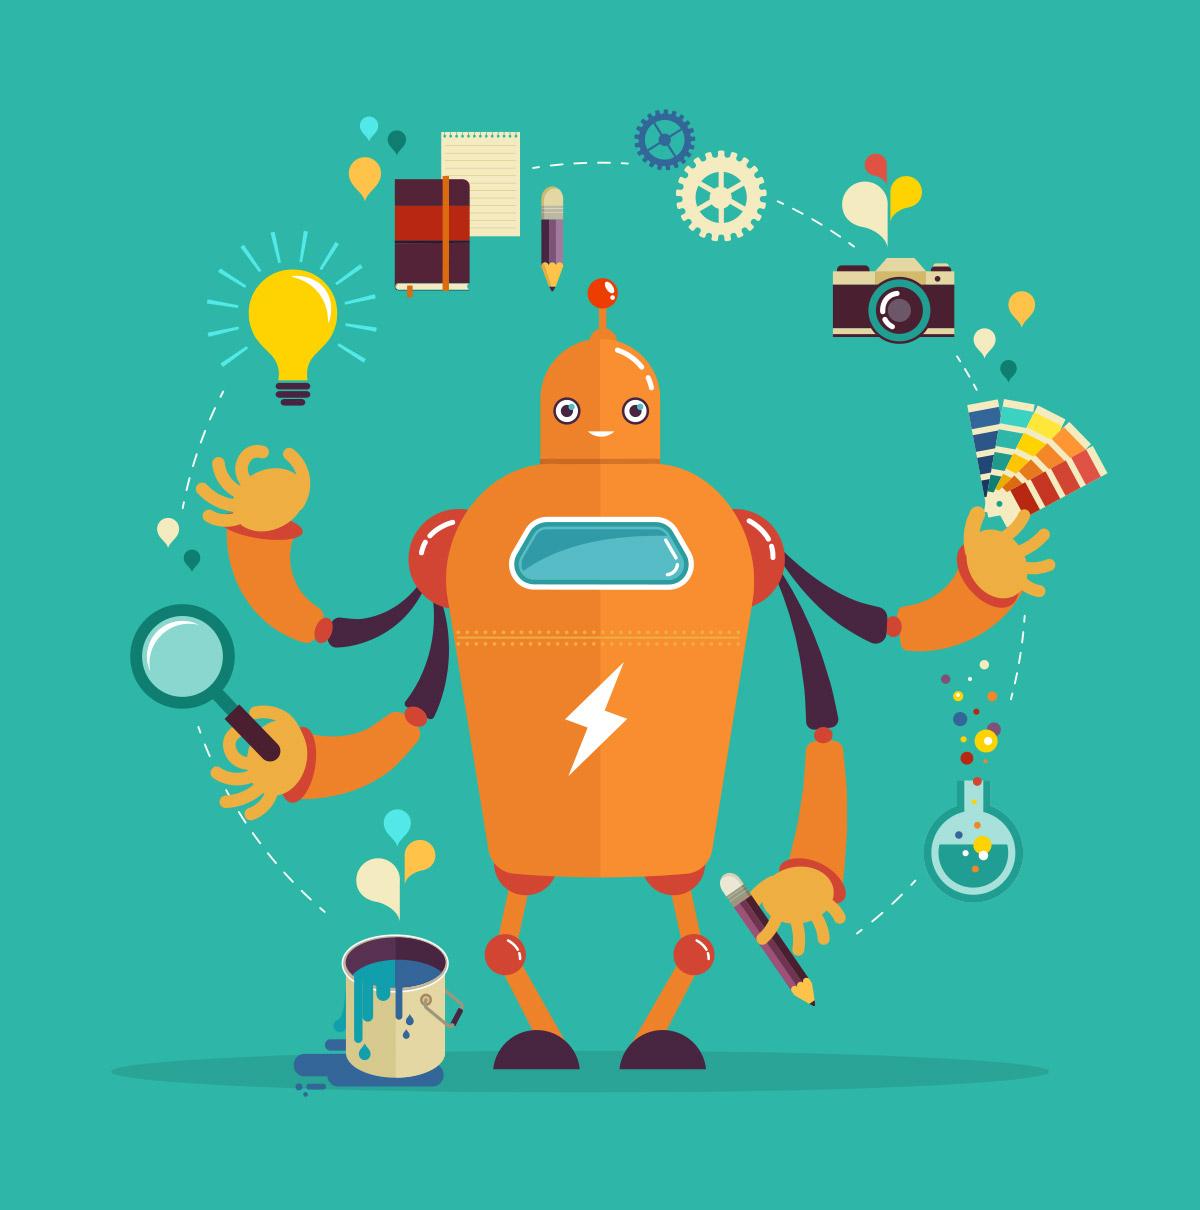 Robot juggling creative elements of design